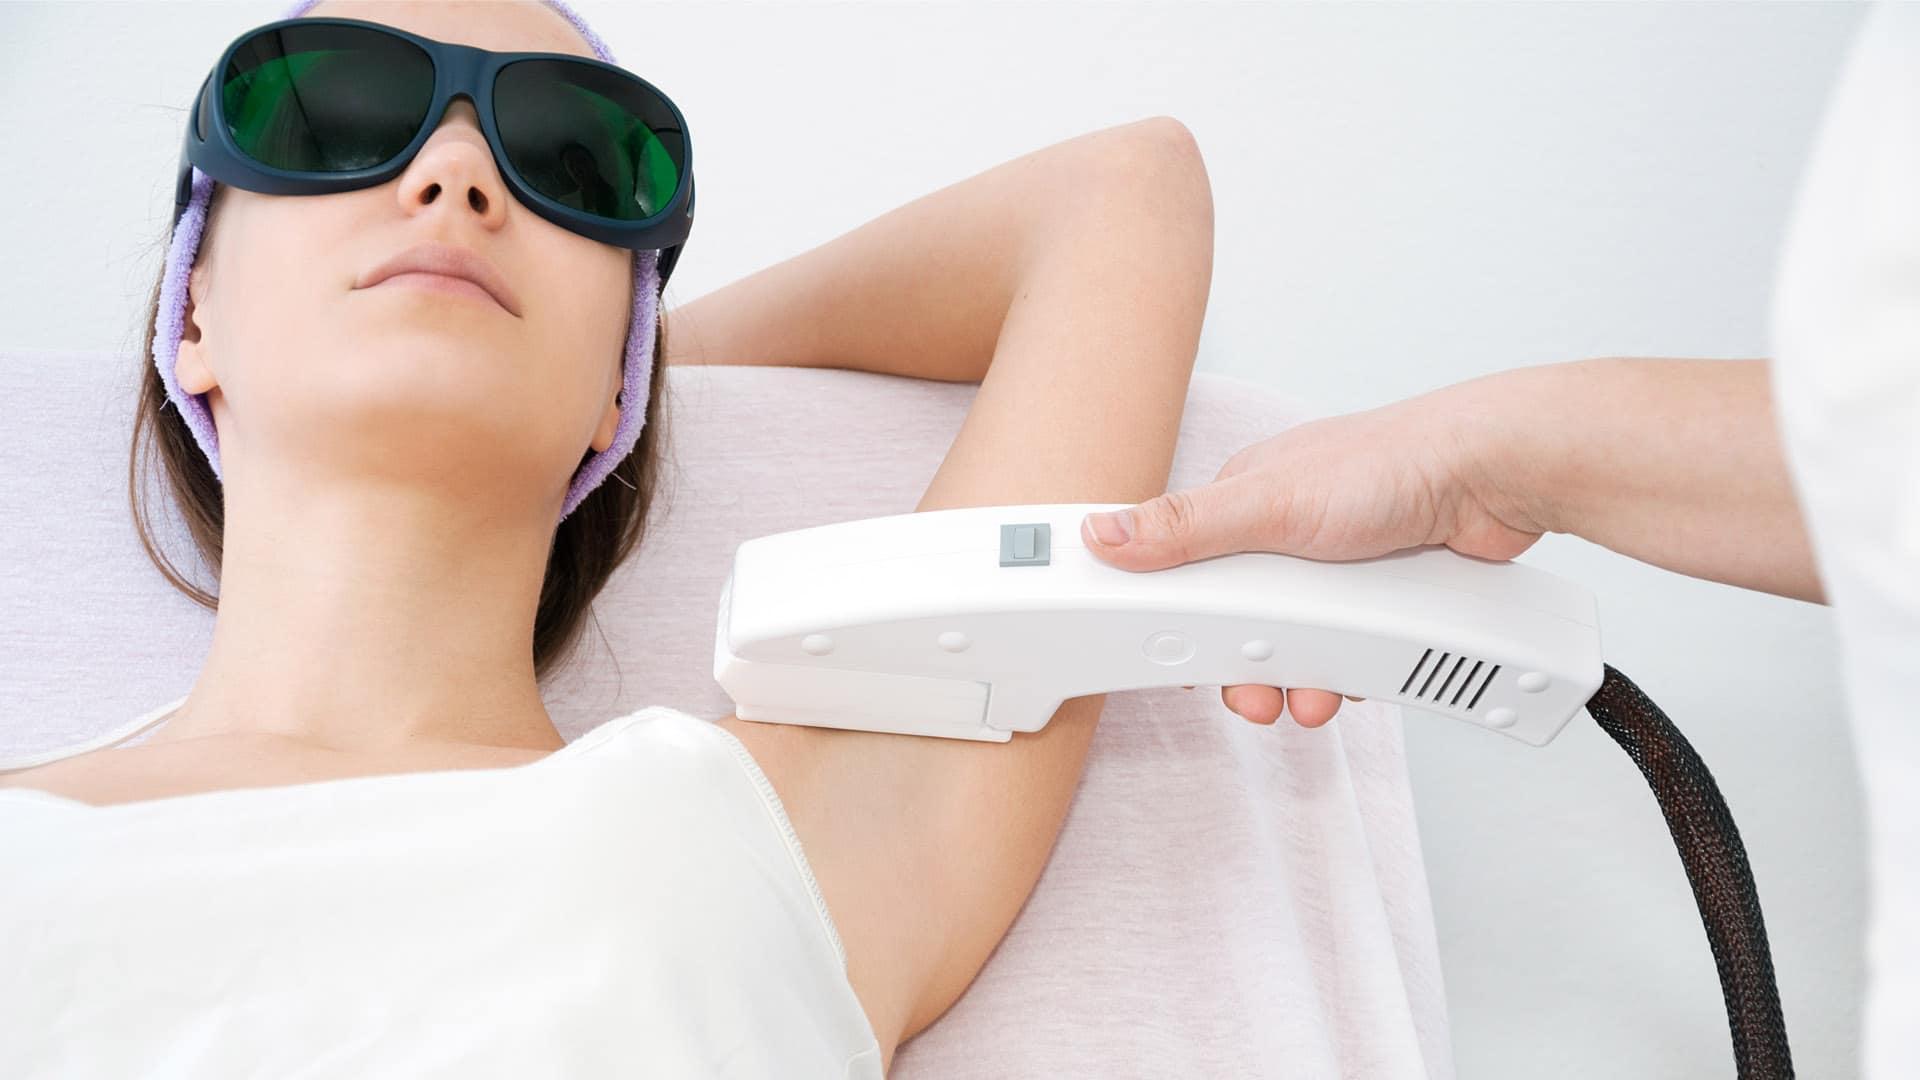 Best IPL Laser Hair Removal Services in Sydney